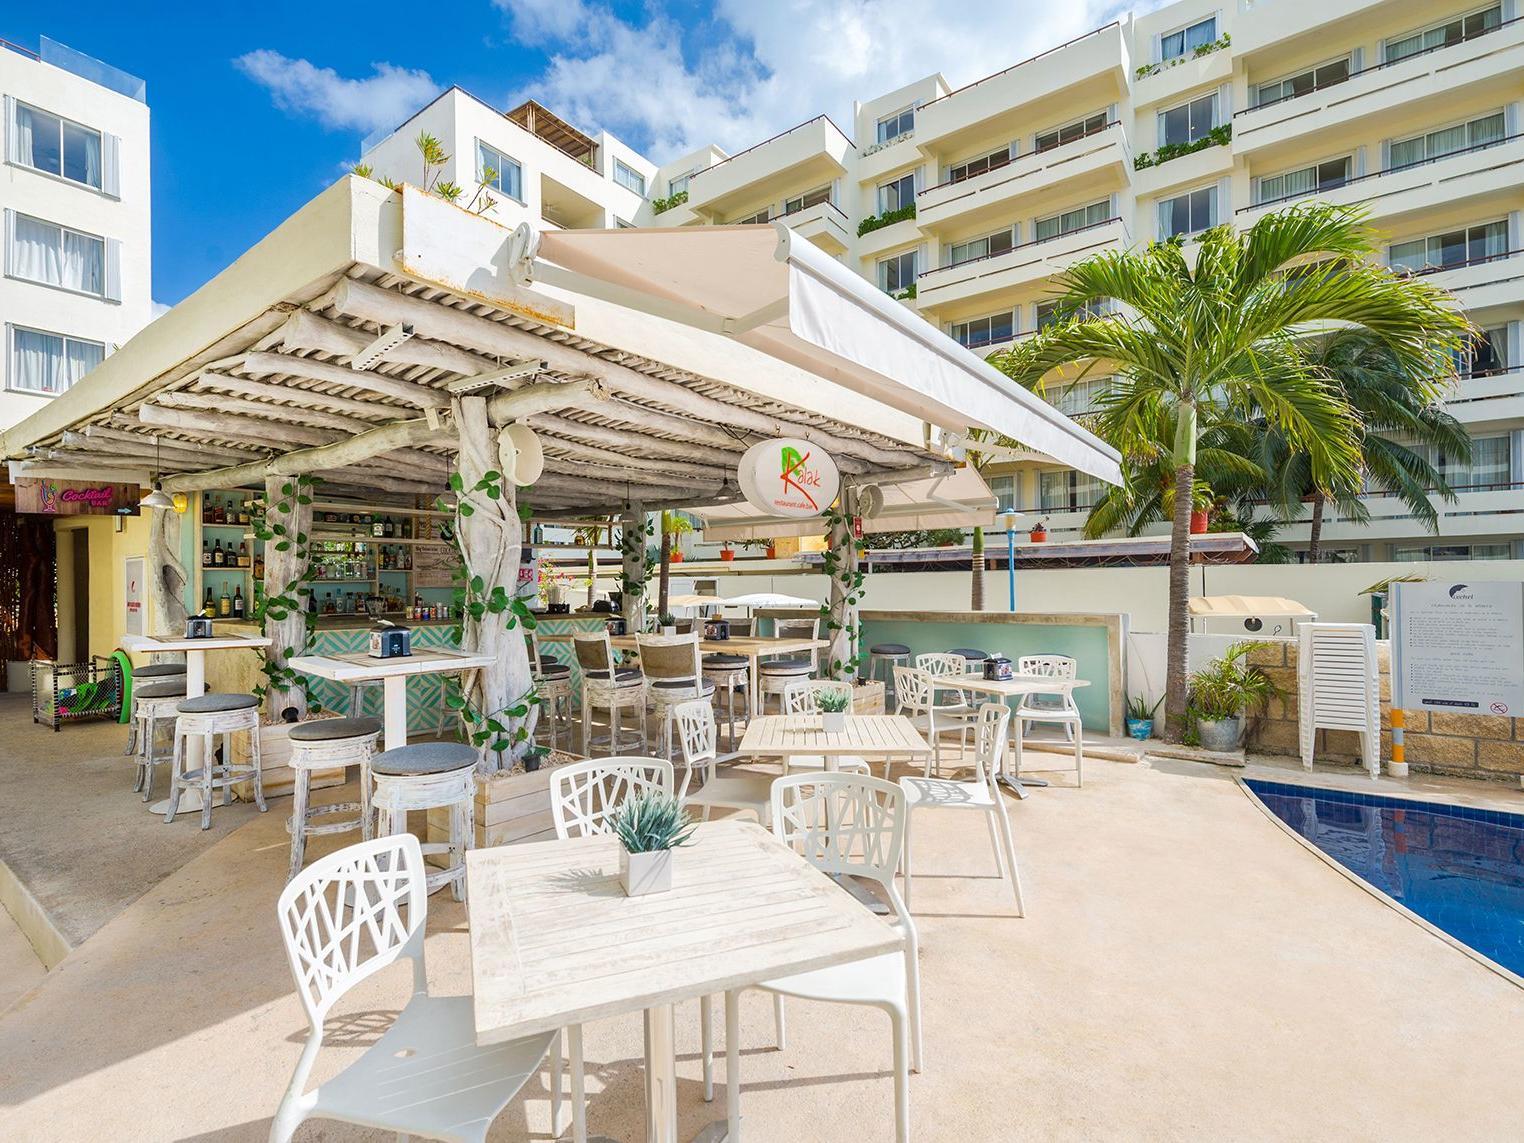 Kalak Restaurant Bar - Ixchel Hotel Isla Mujeres